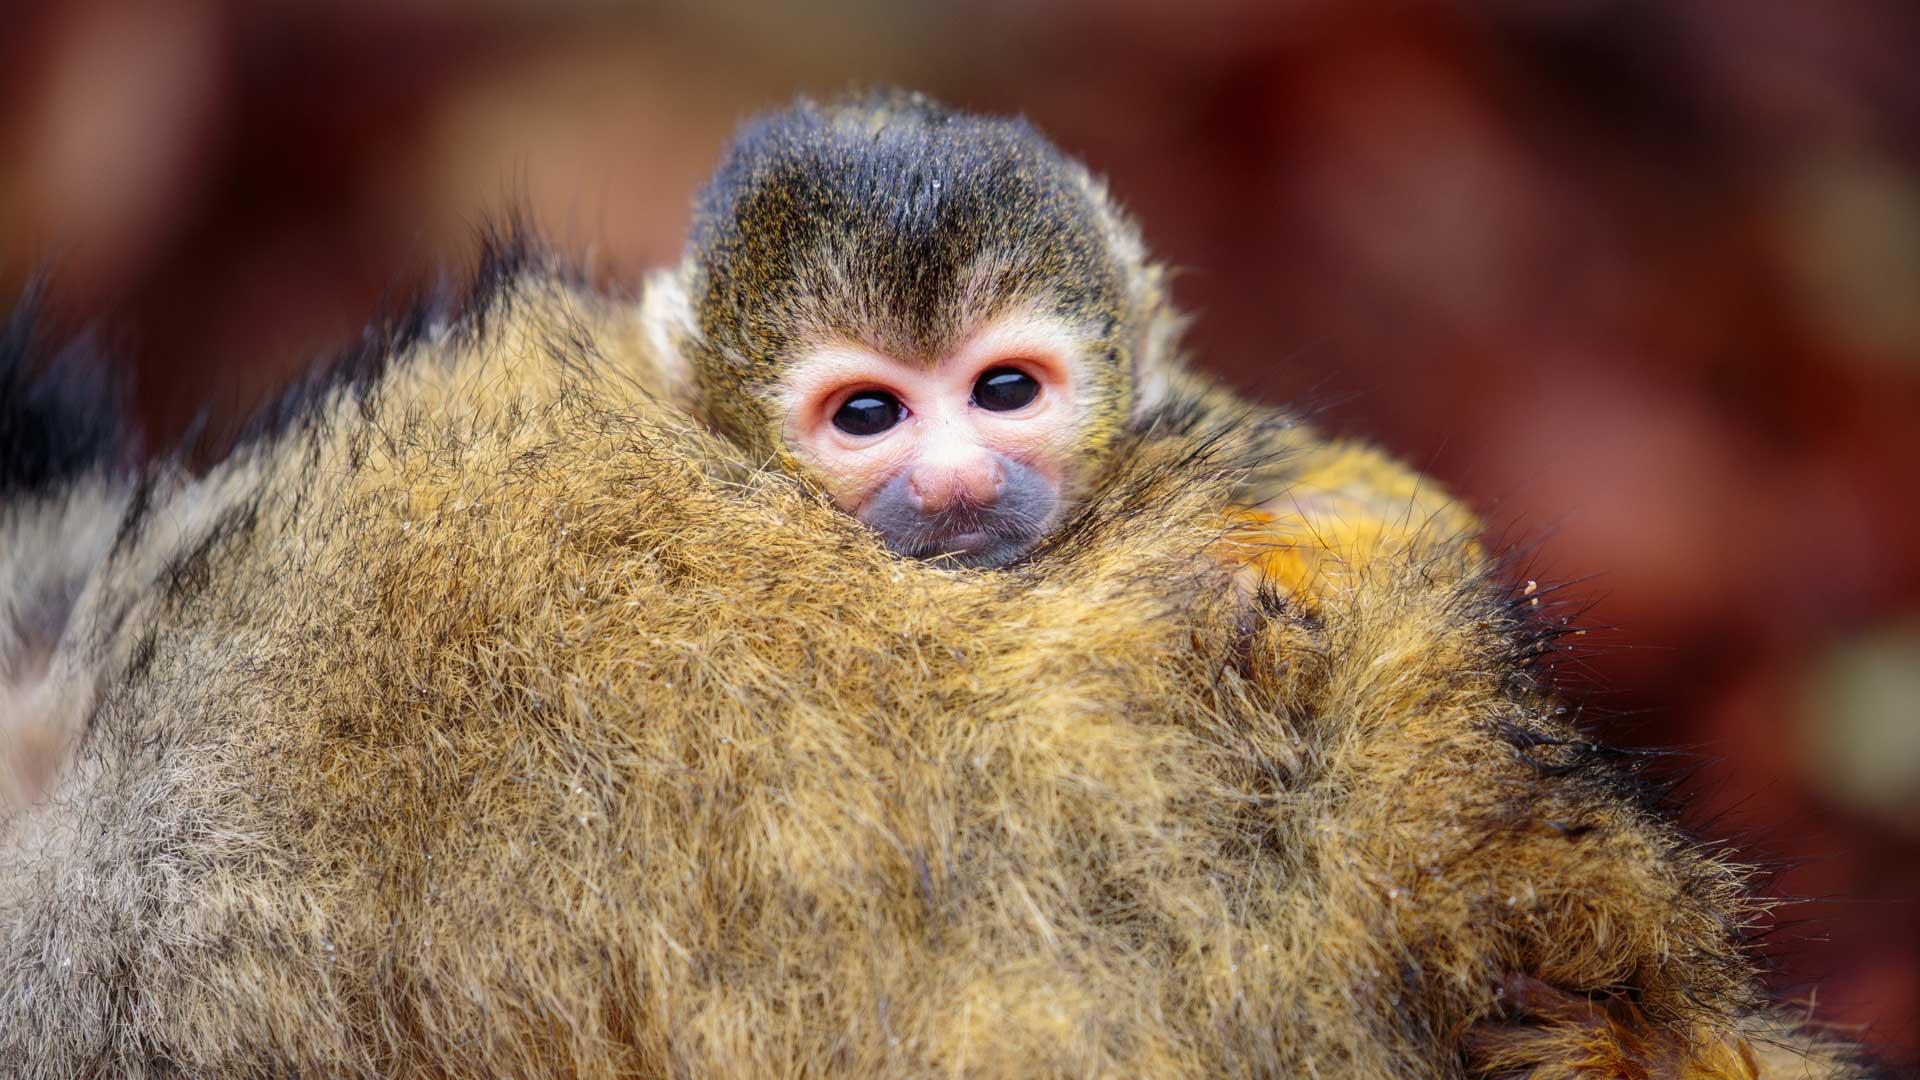 https://rfacdn.nz/zoo/assets/media/squirrel-monkey-picaro-gallery-4.jpg